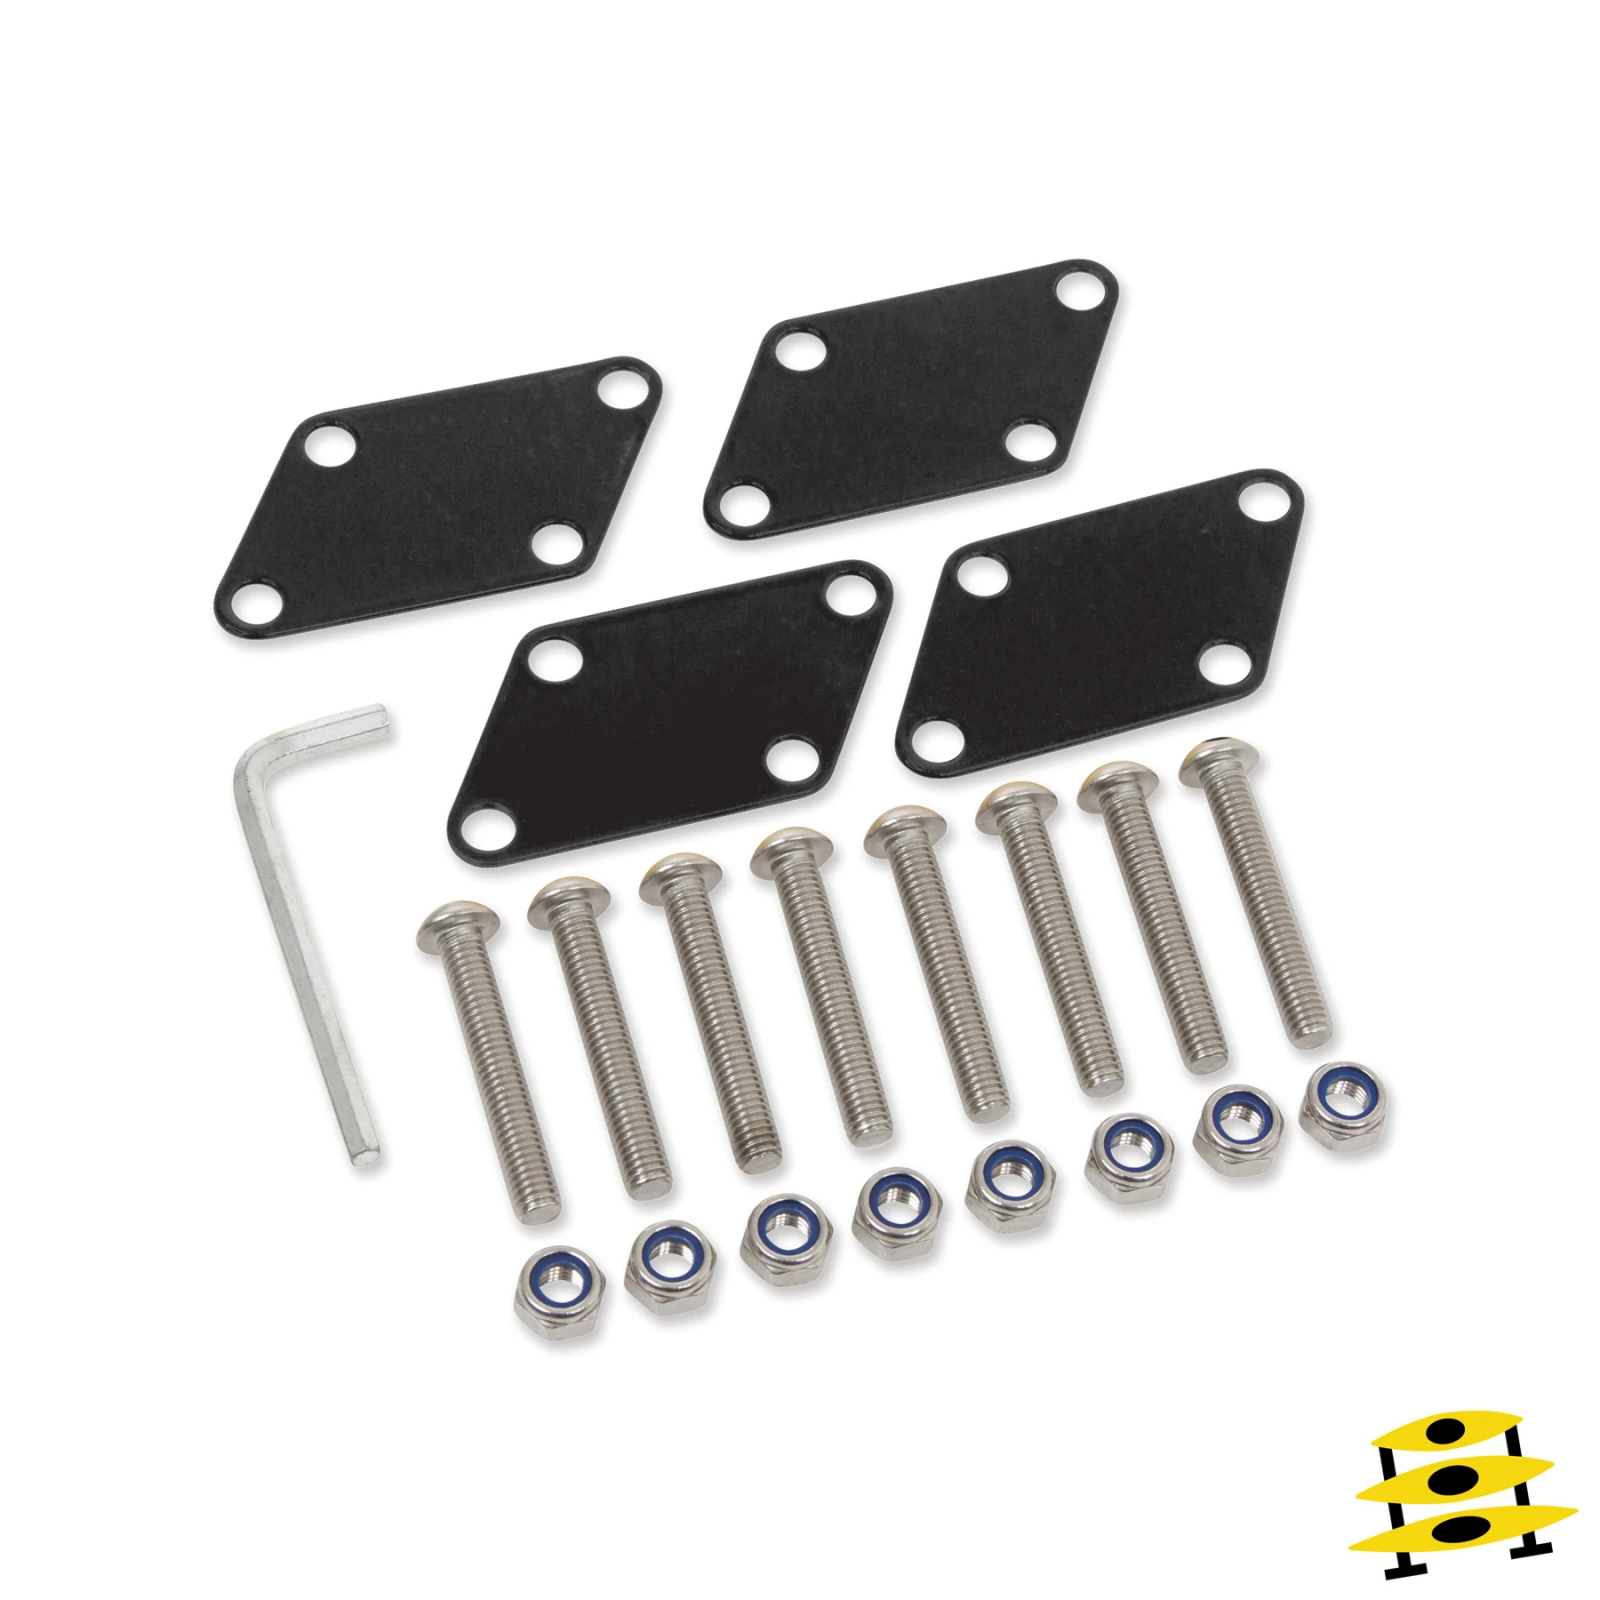 Suspenz - SUP Rack Expansion Plates Marine Grade/Blk